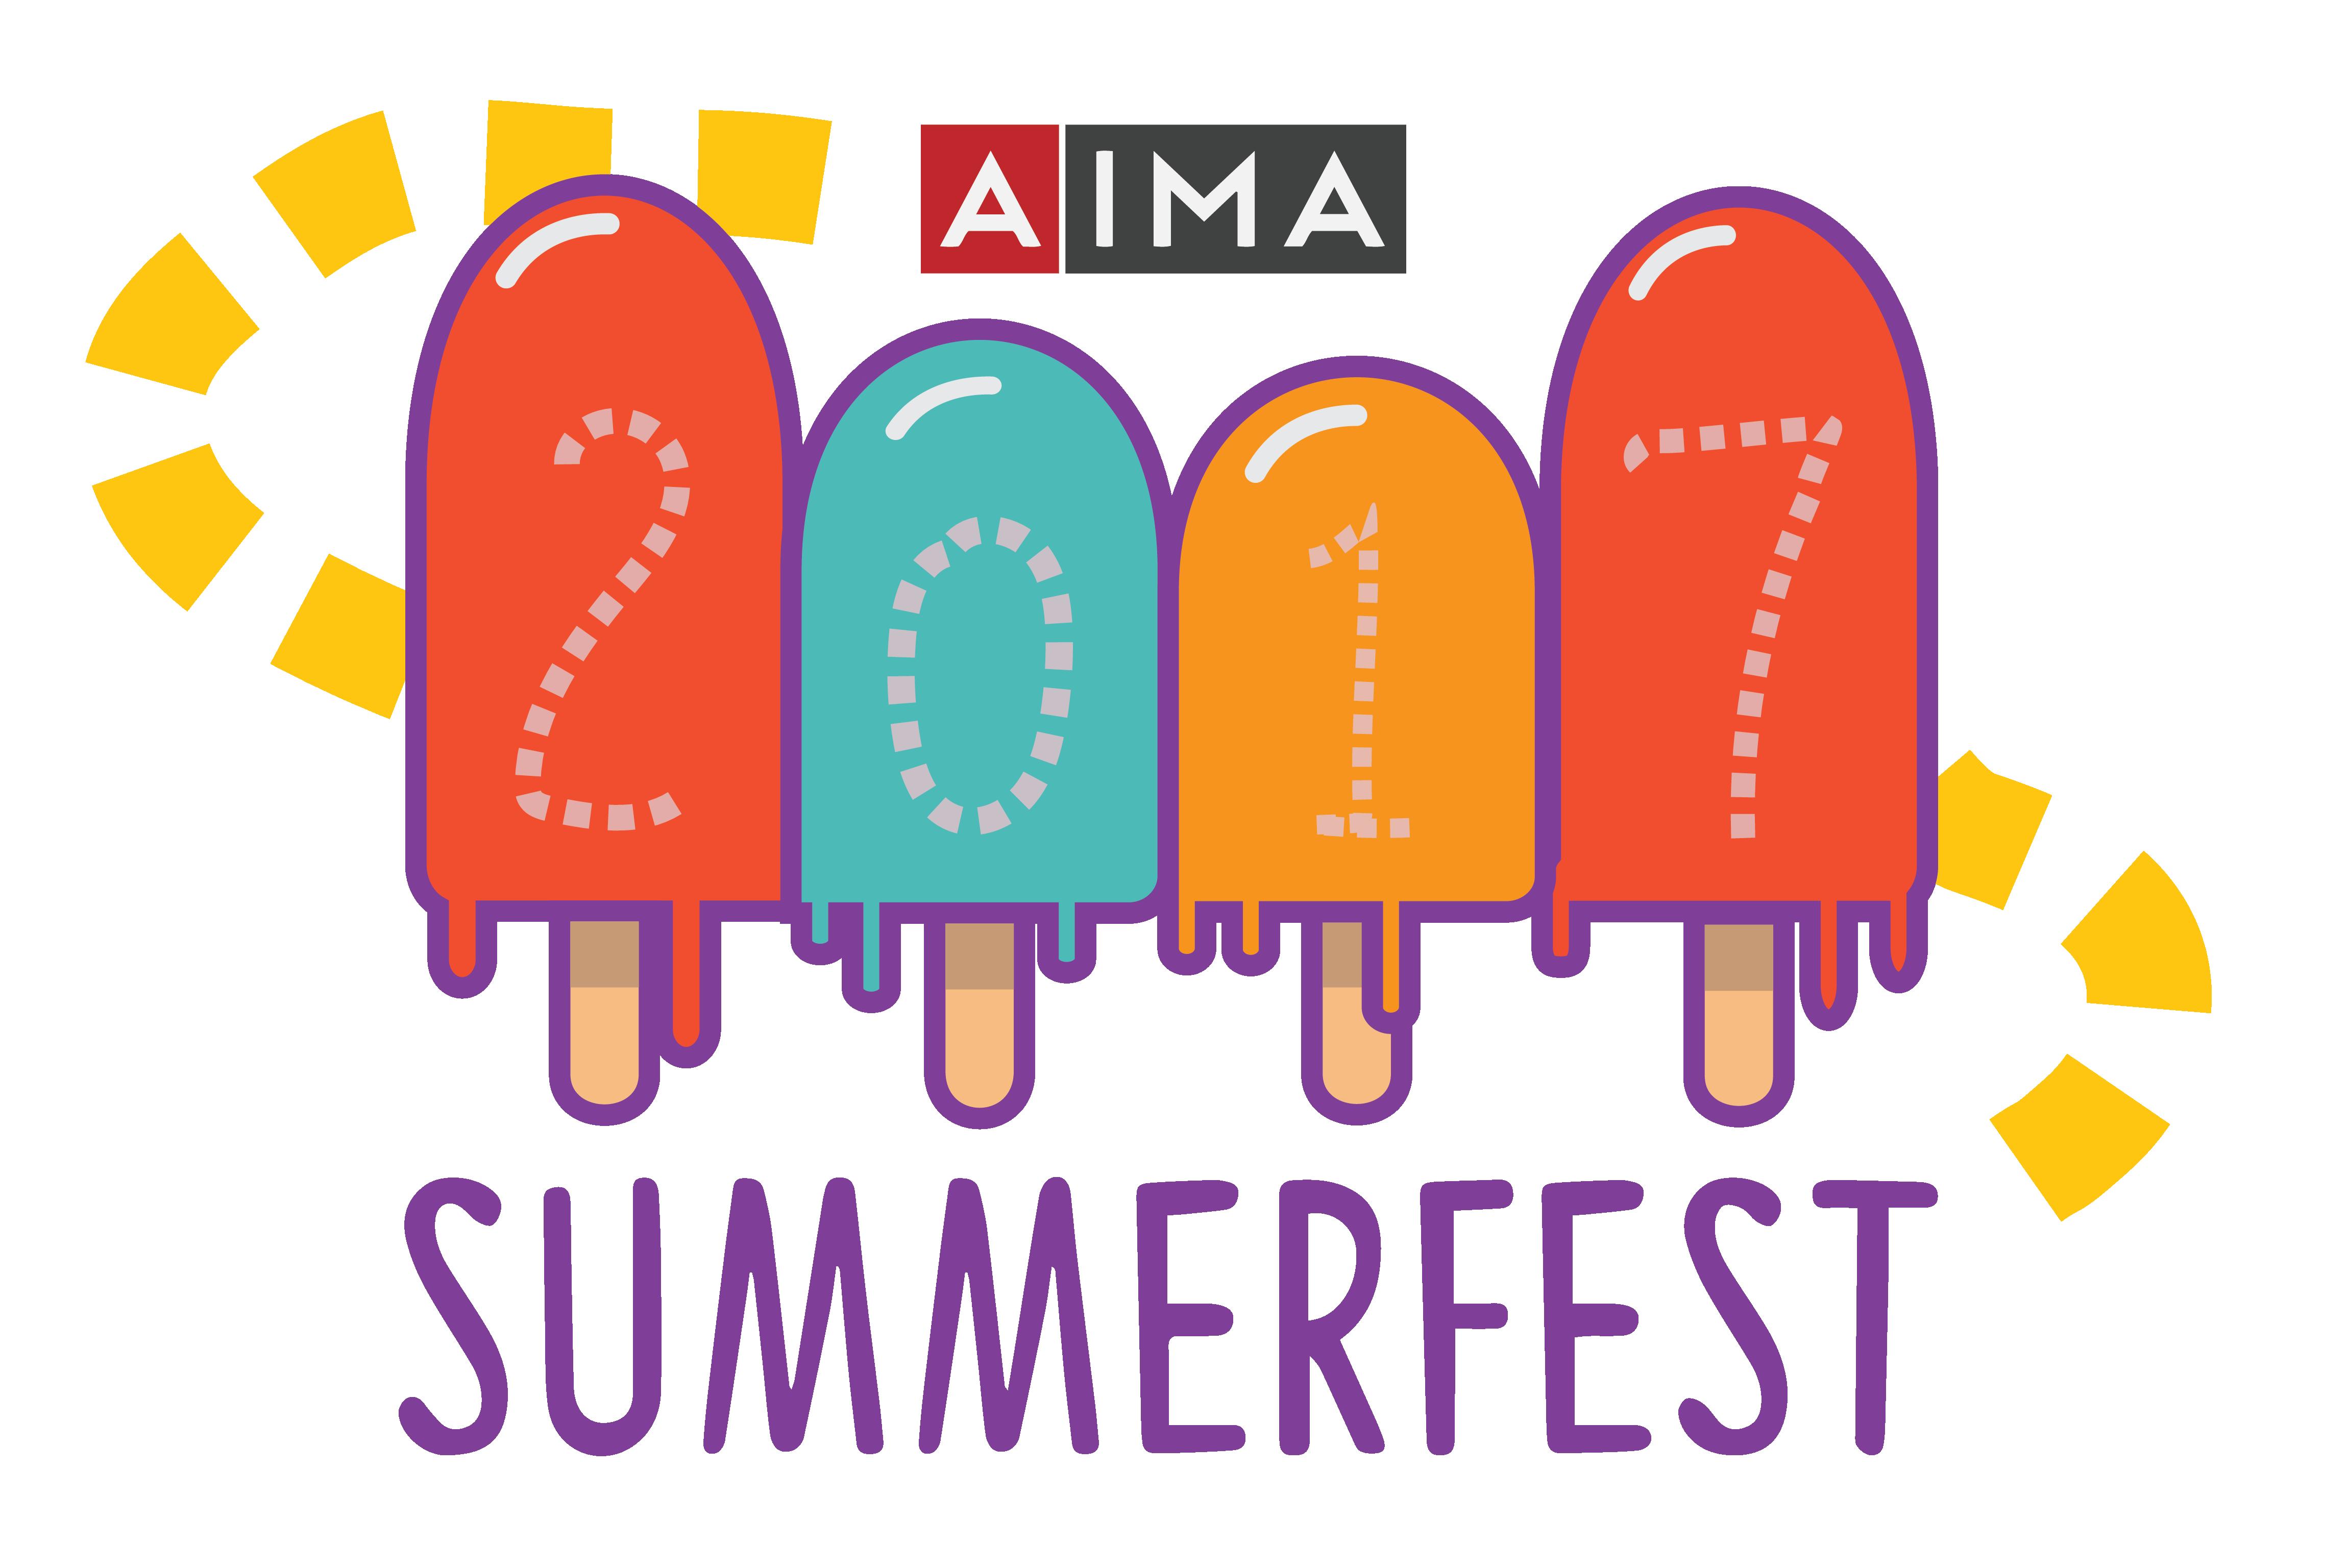 Popsicle clipart red Marketing SummerFest Association AIMA AIMA